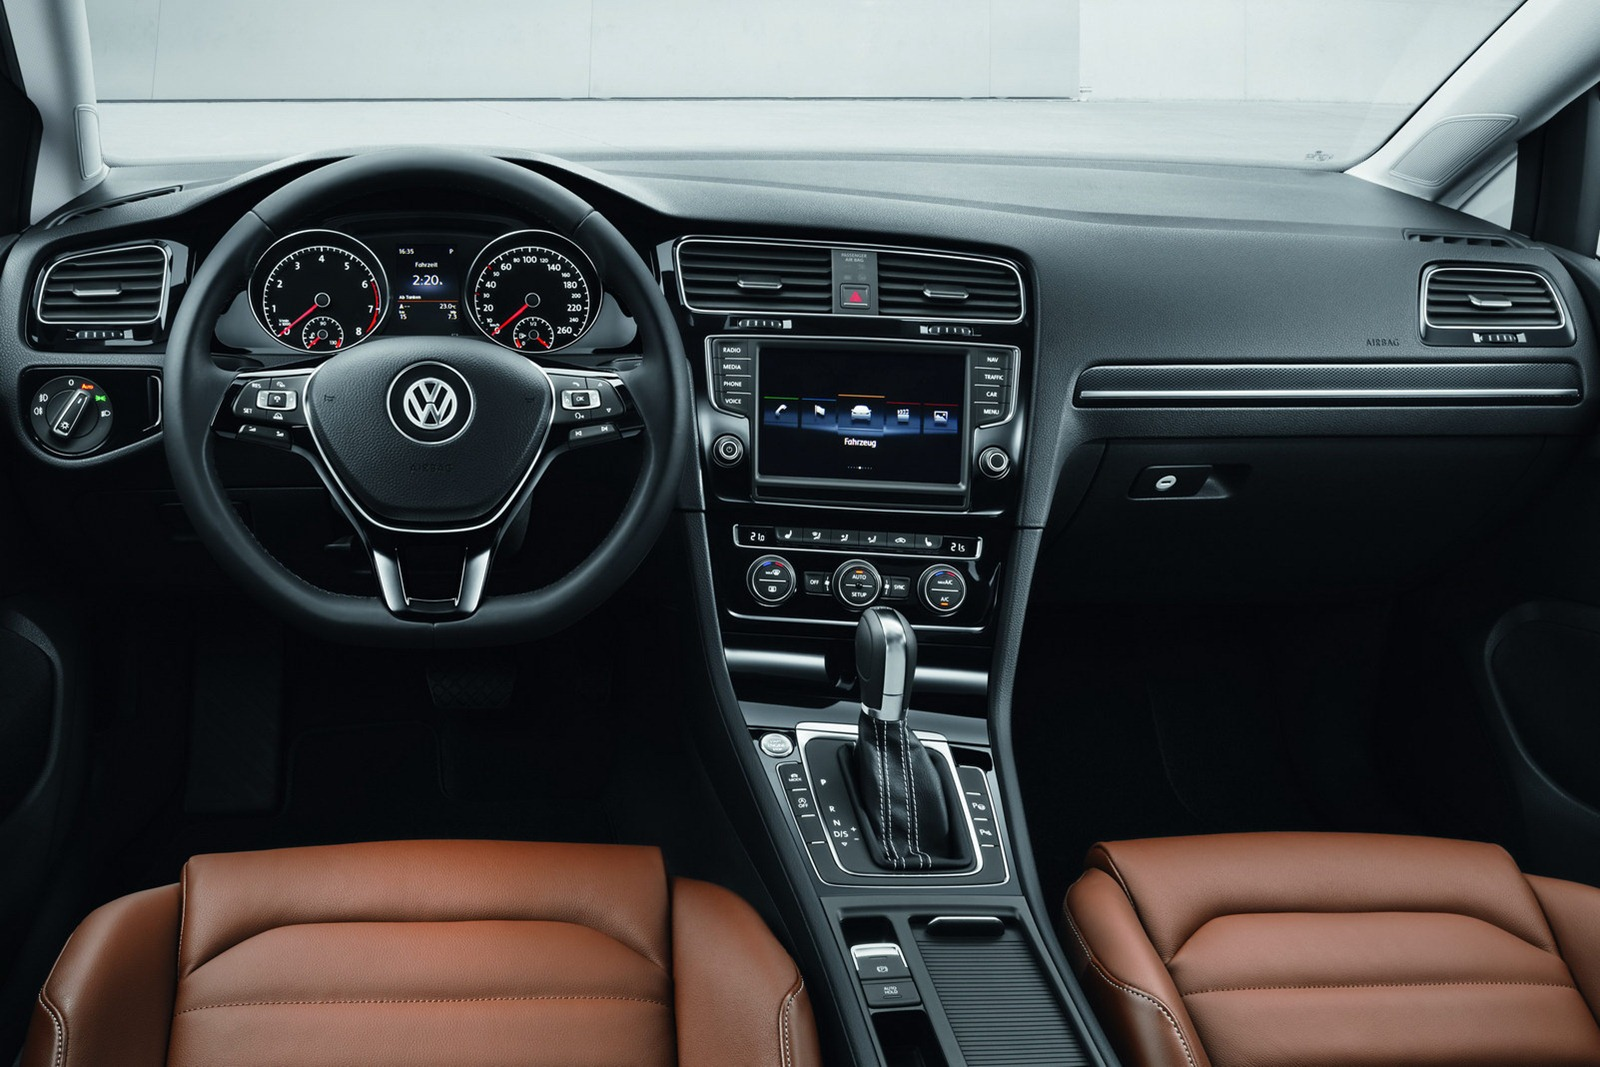 2013-VW-Mk7-Golf-Interior-4 - ForceGT.com